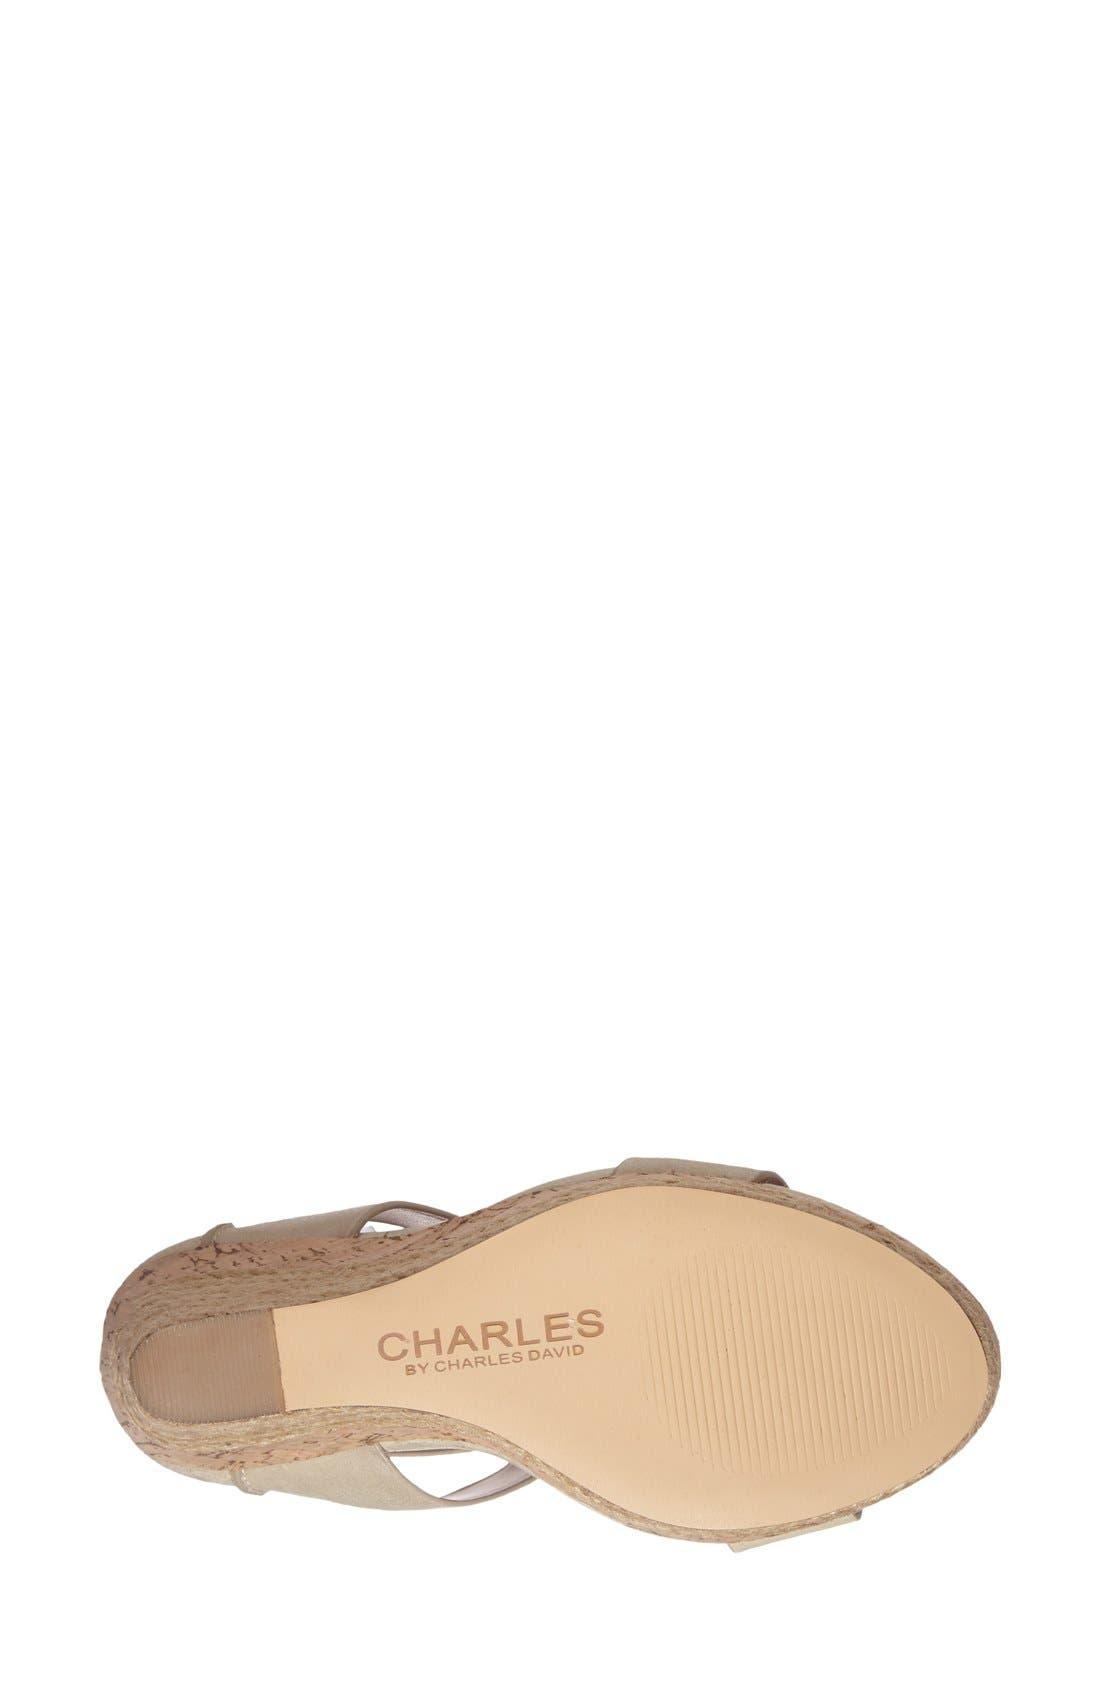 Alternate Image 4  - Charles by Charles David 'Adament' Wedge Sandal (Women)